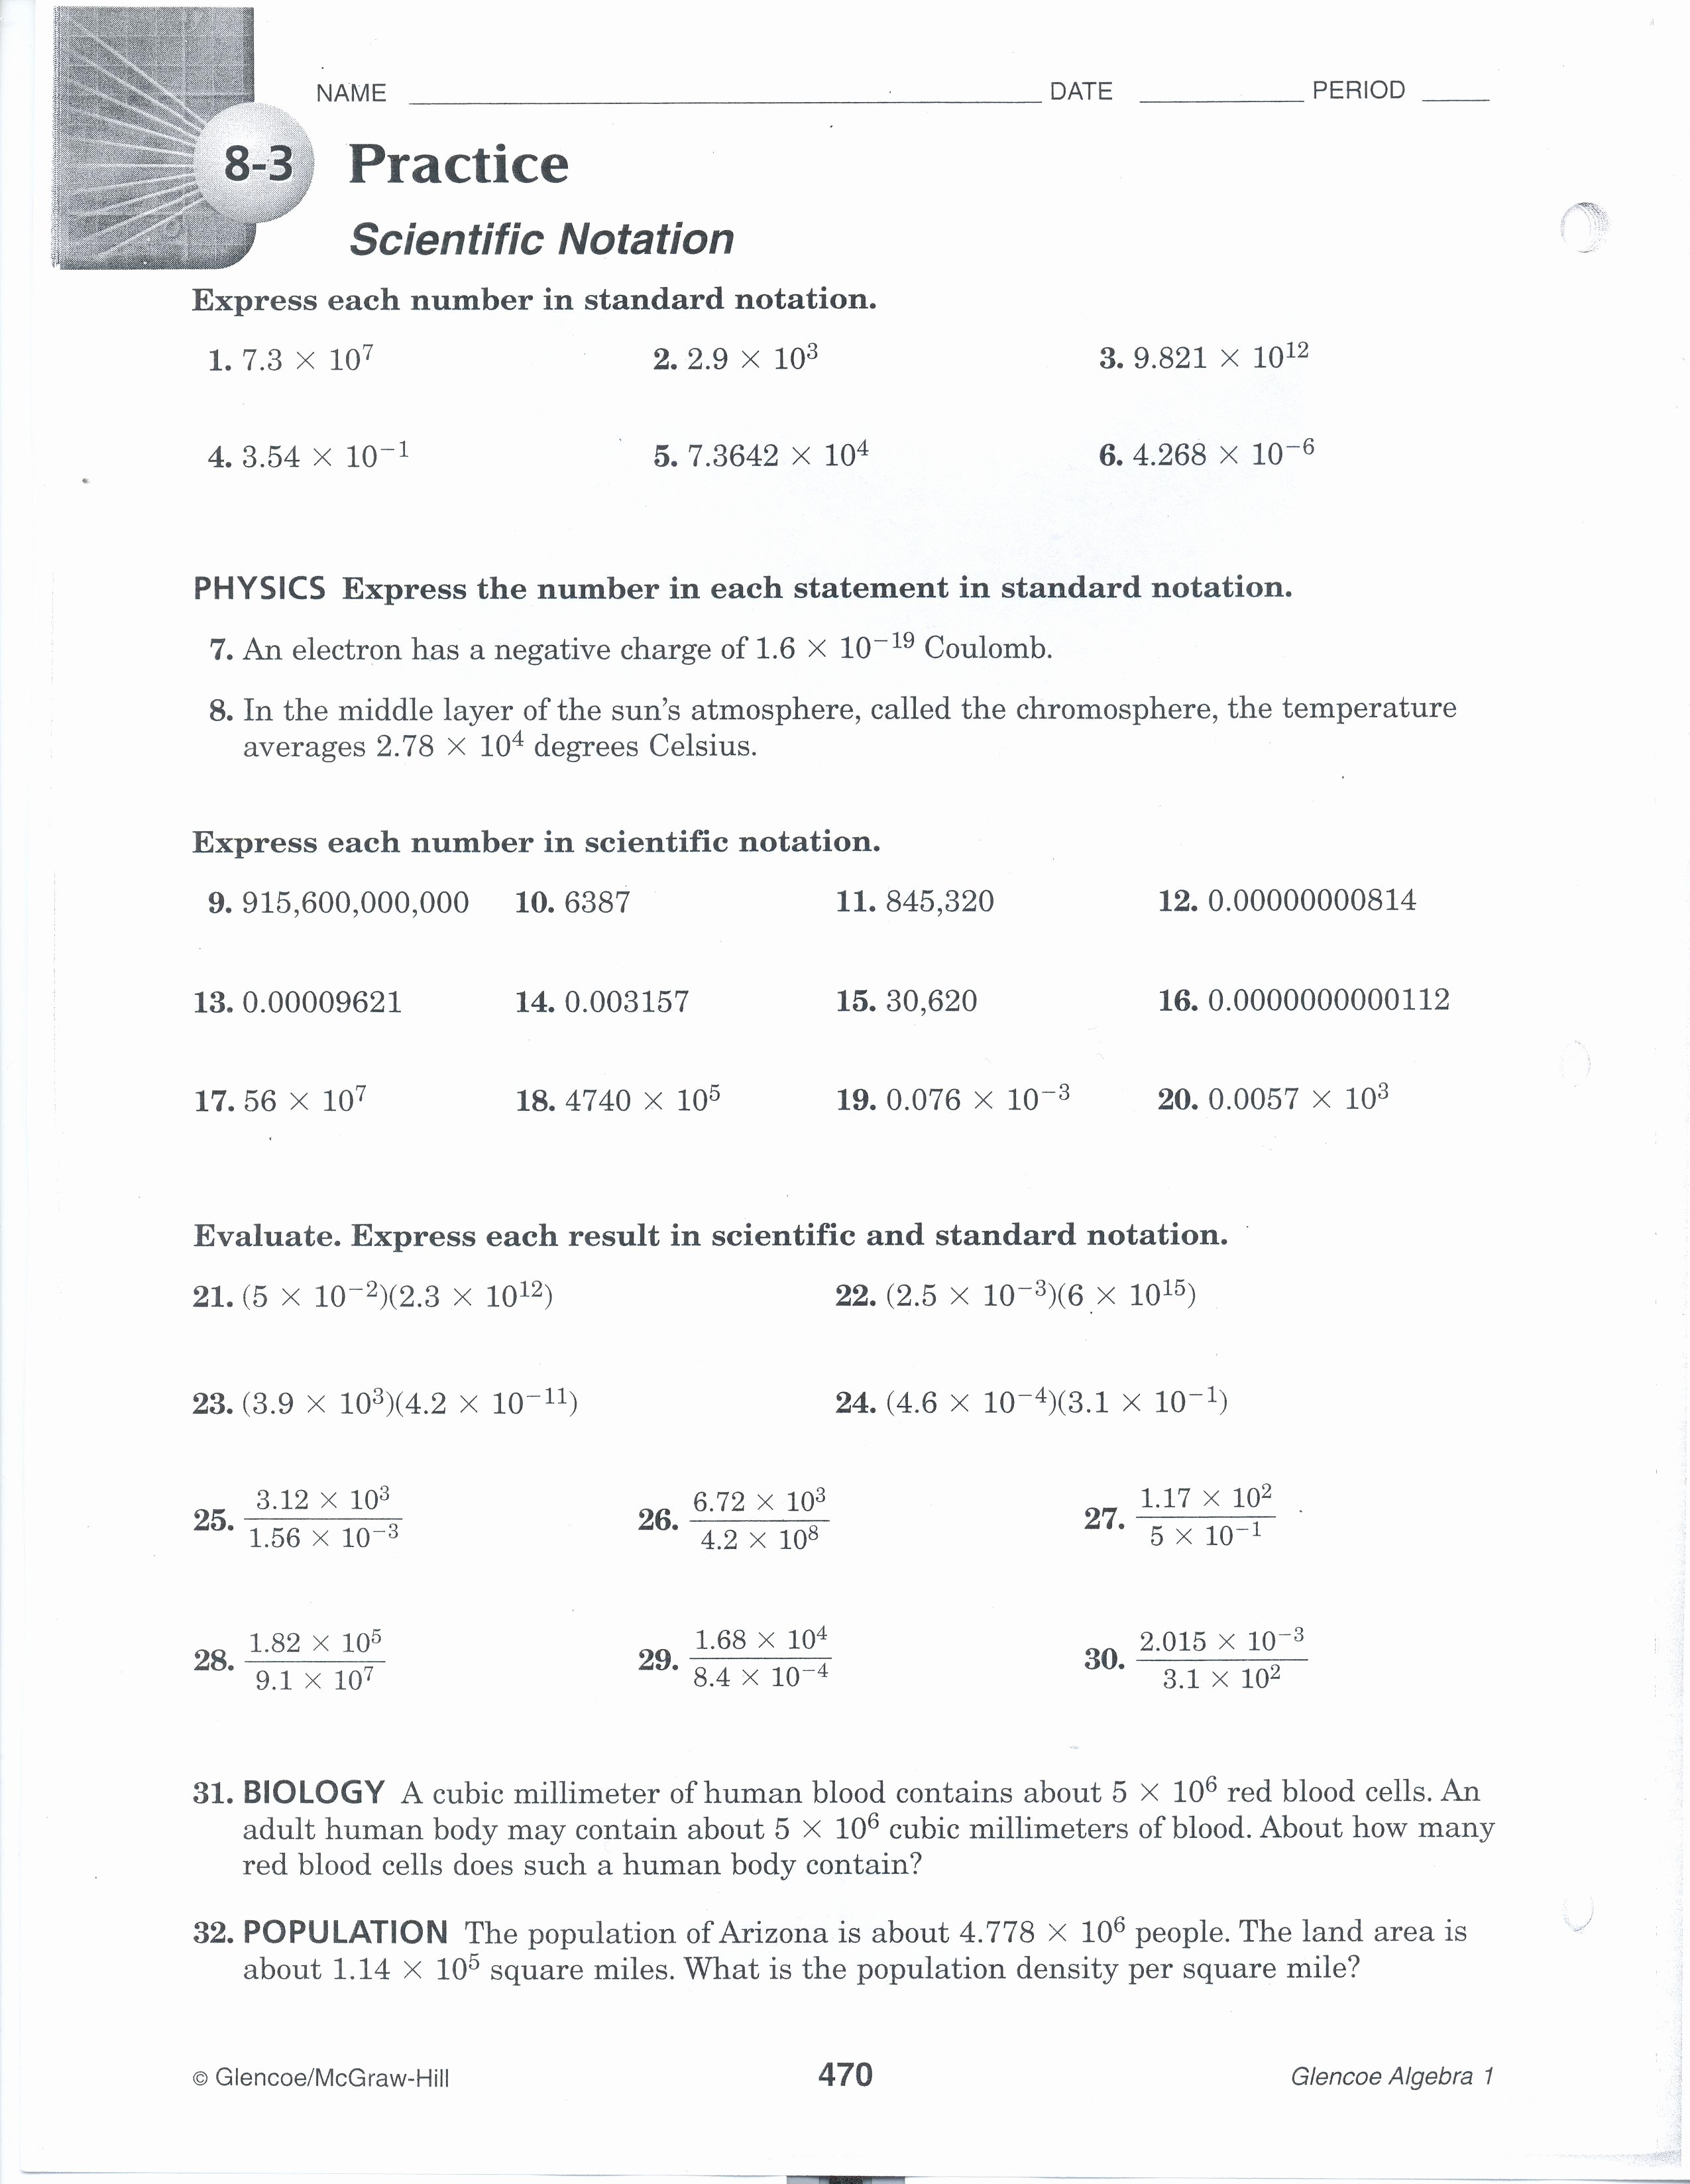 Scientific Notation Practice Worksheet Luxury Nauset Regional School District – Green Pre Algebra – Essign